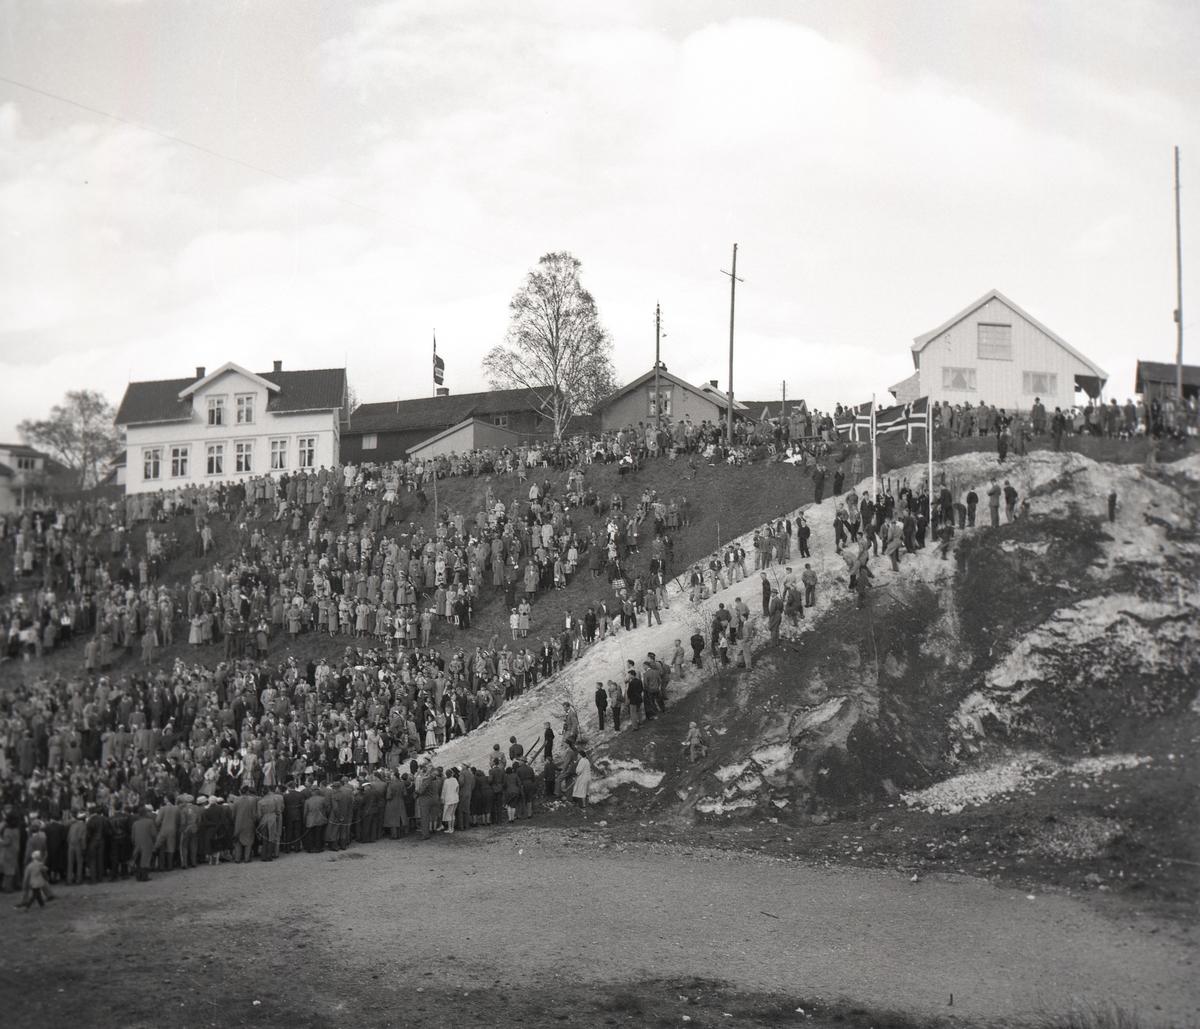 Carnival ski show at Skauløkka, Kongsberg